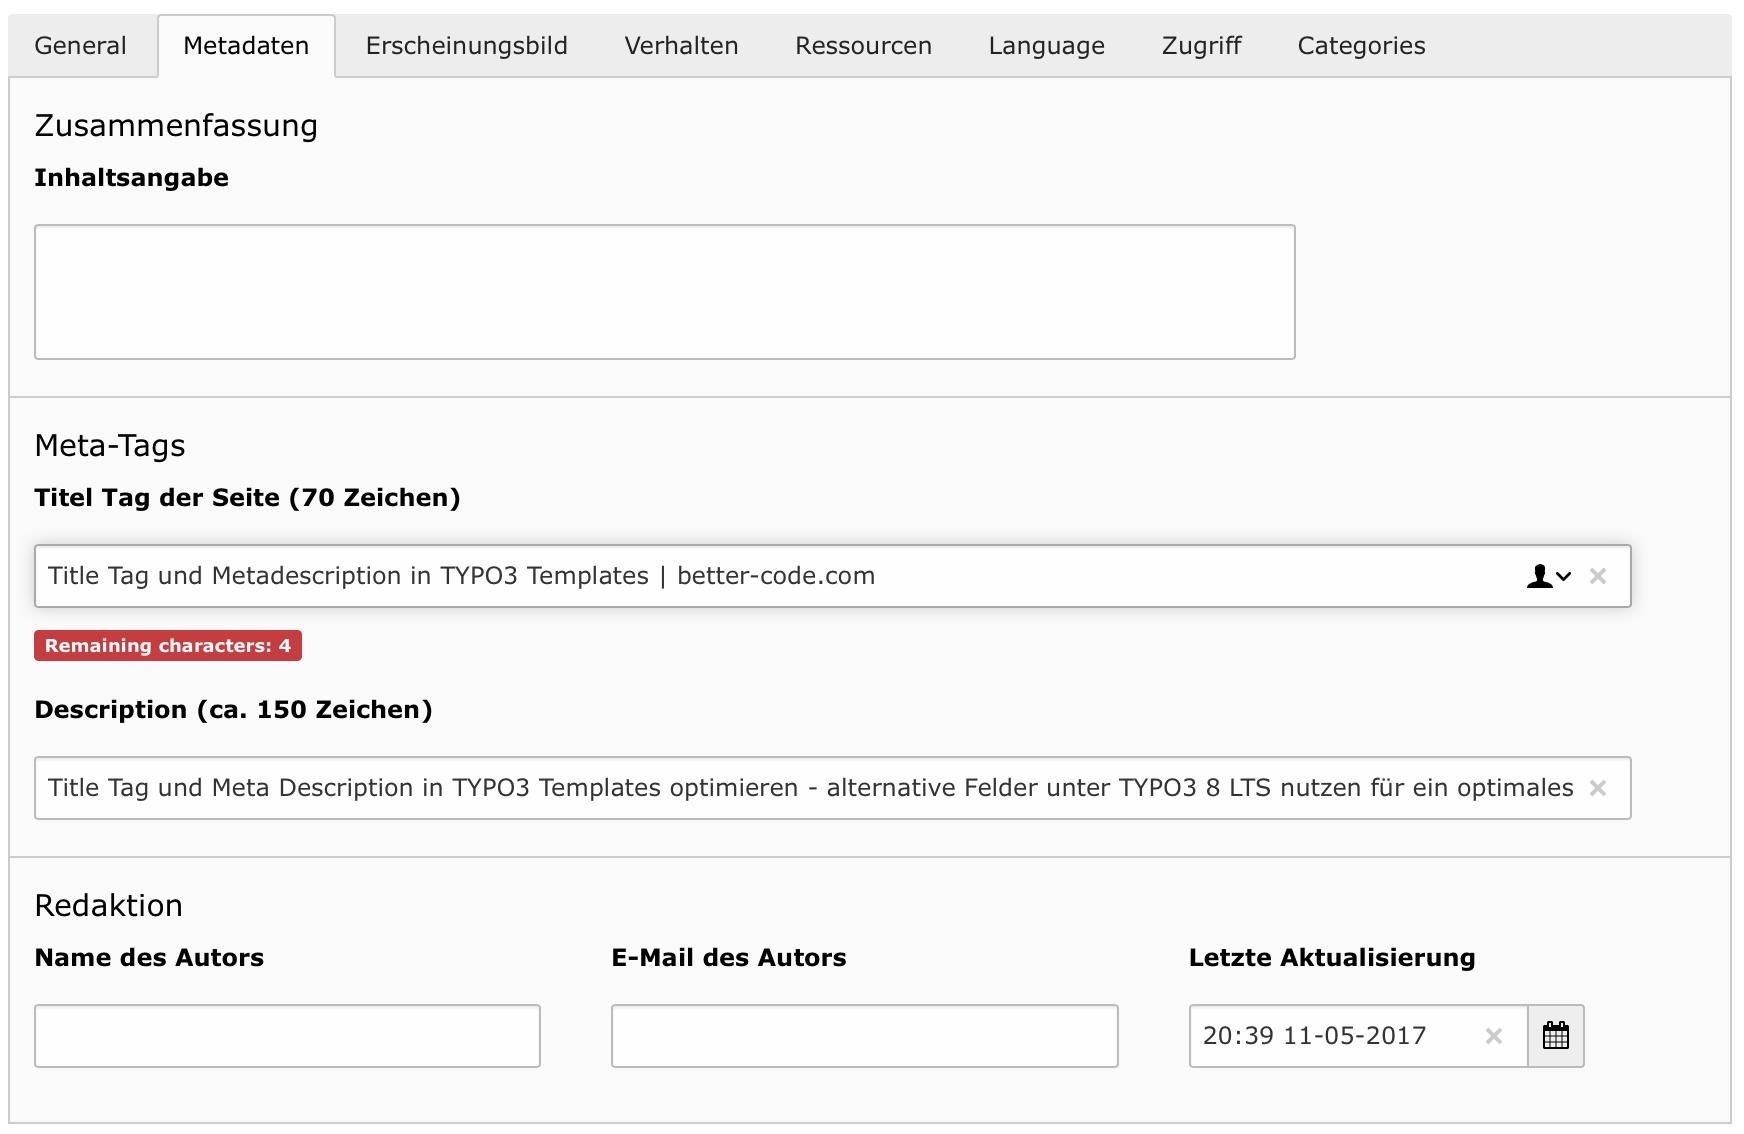 Title Tag Und Metadescription In Typo3 Templates Better Codecom